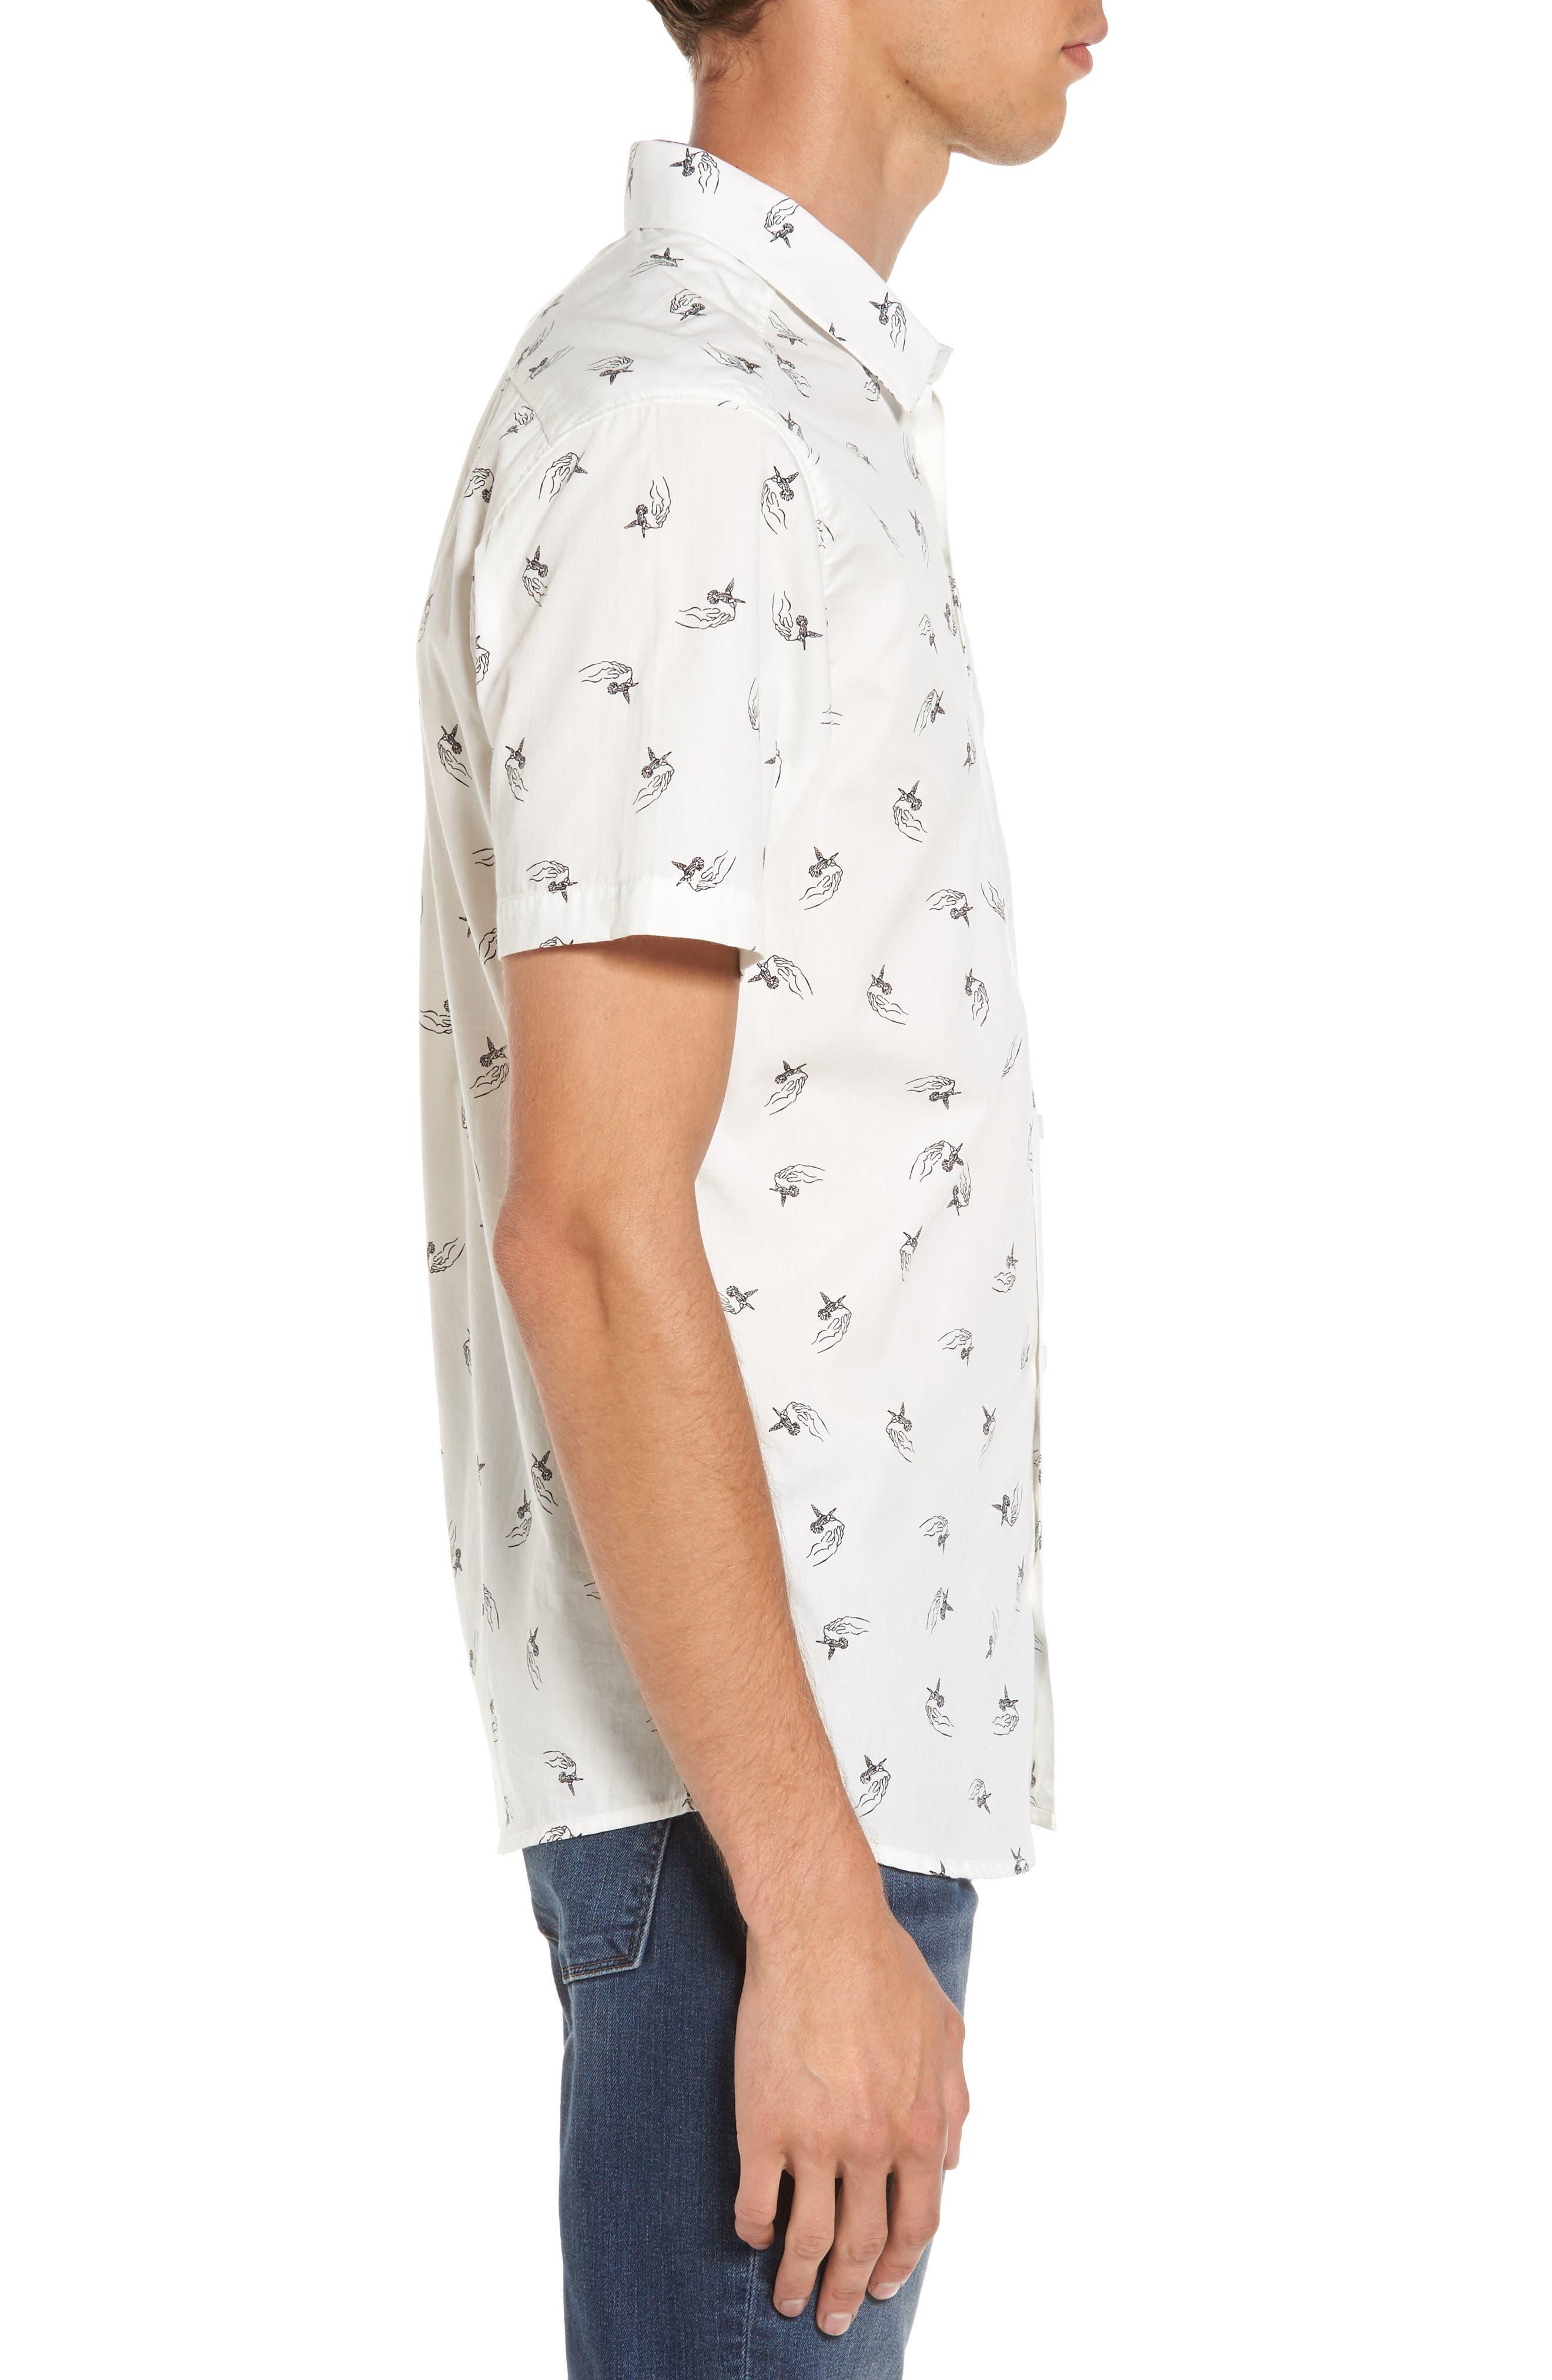 x Kevin Long Hummingbird Woven Shirt,                             Alternate thumbnail 3, color,                             Antique White